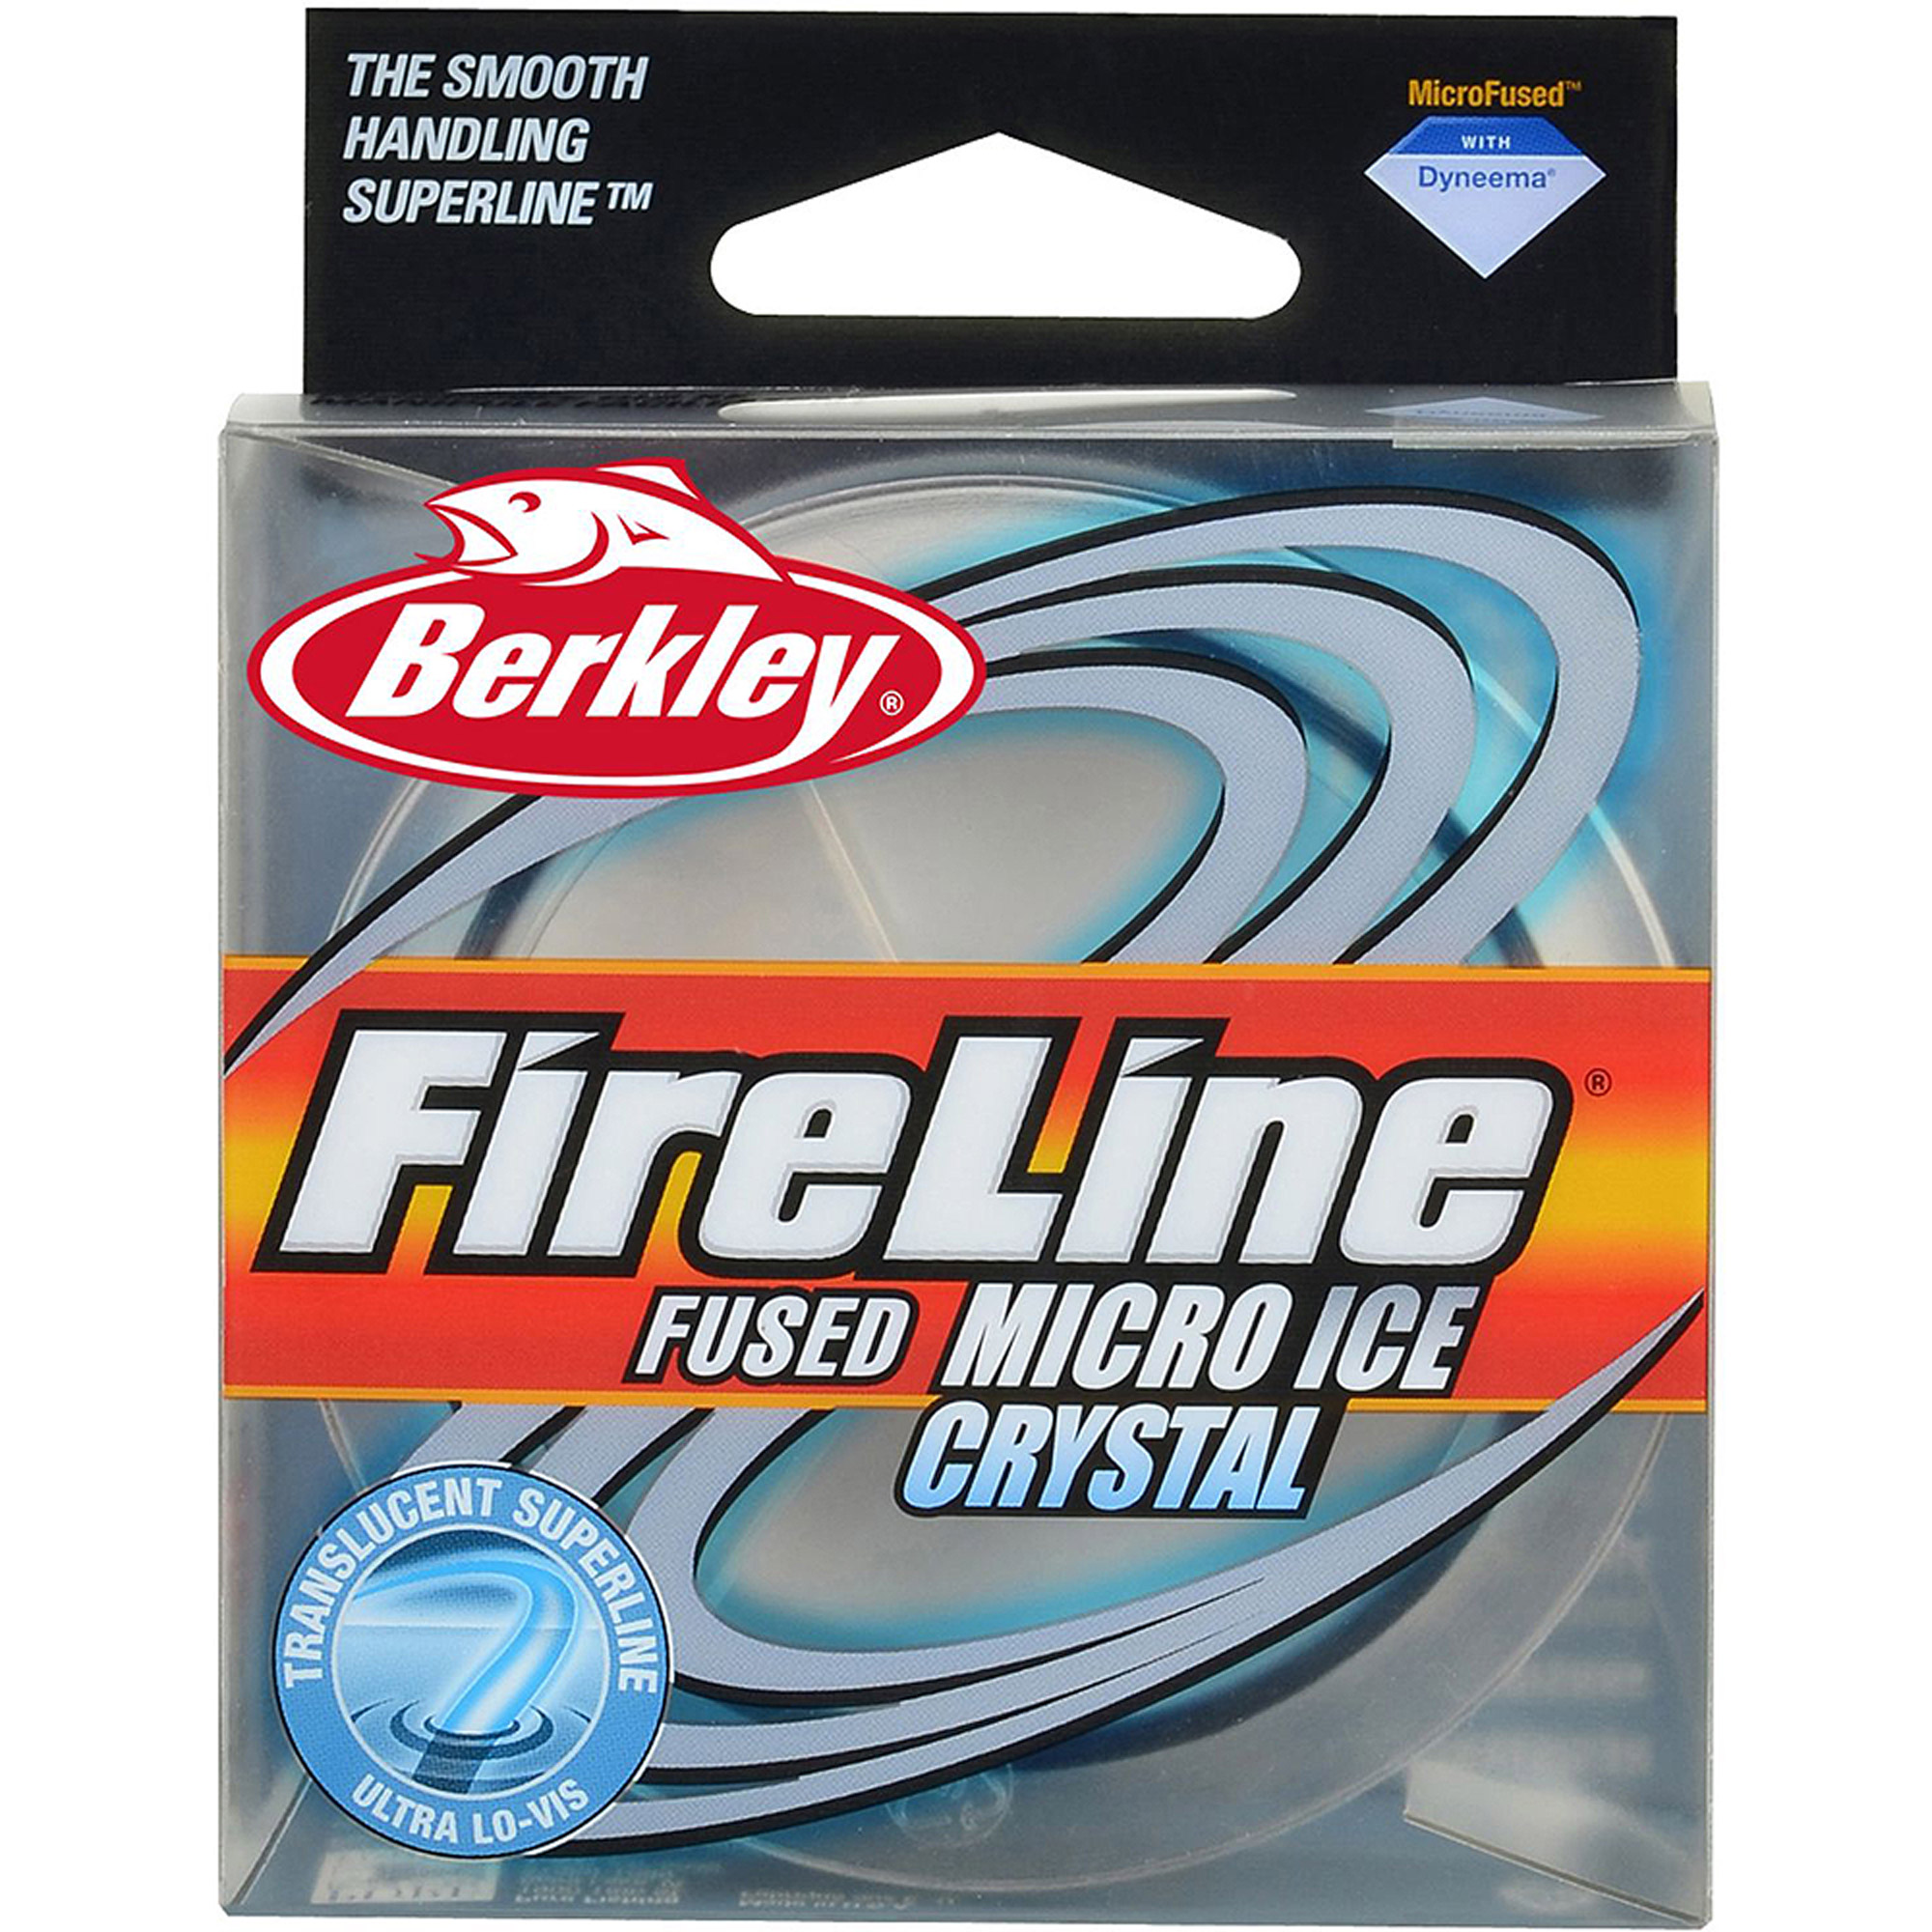 Berkley Fireline Micro Ice Fused Original Fishing Line, 50 yd Pony Spool